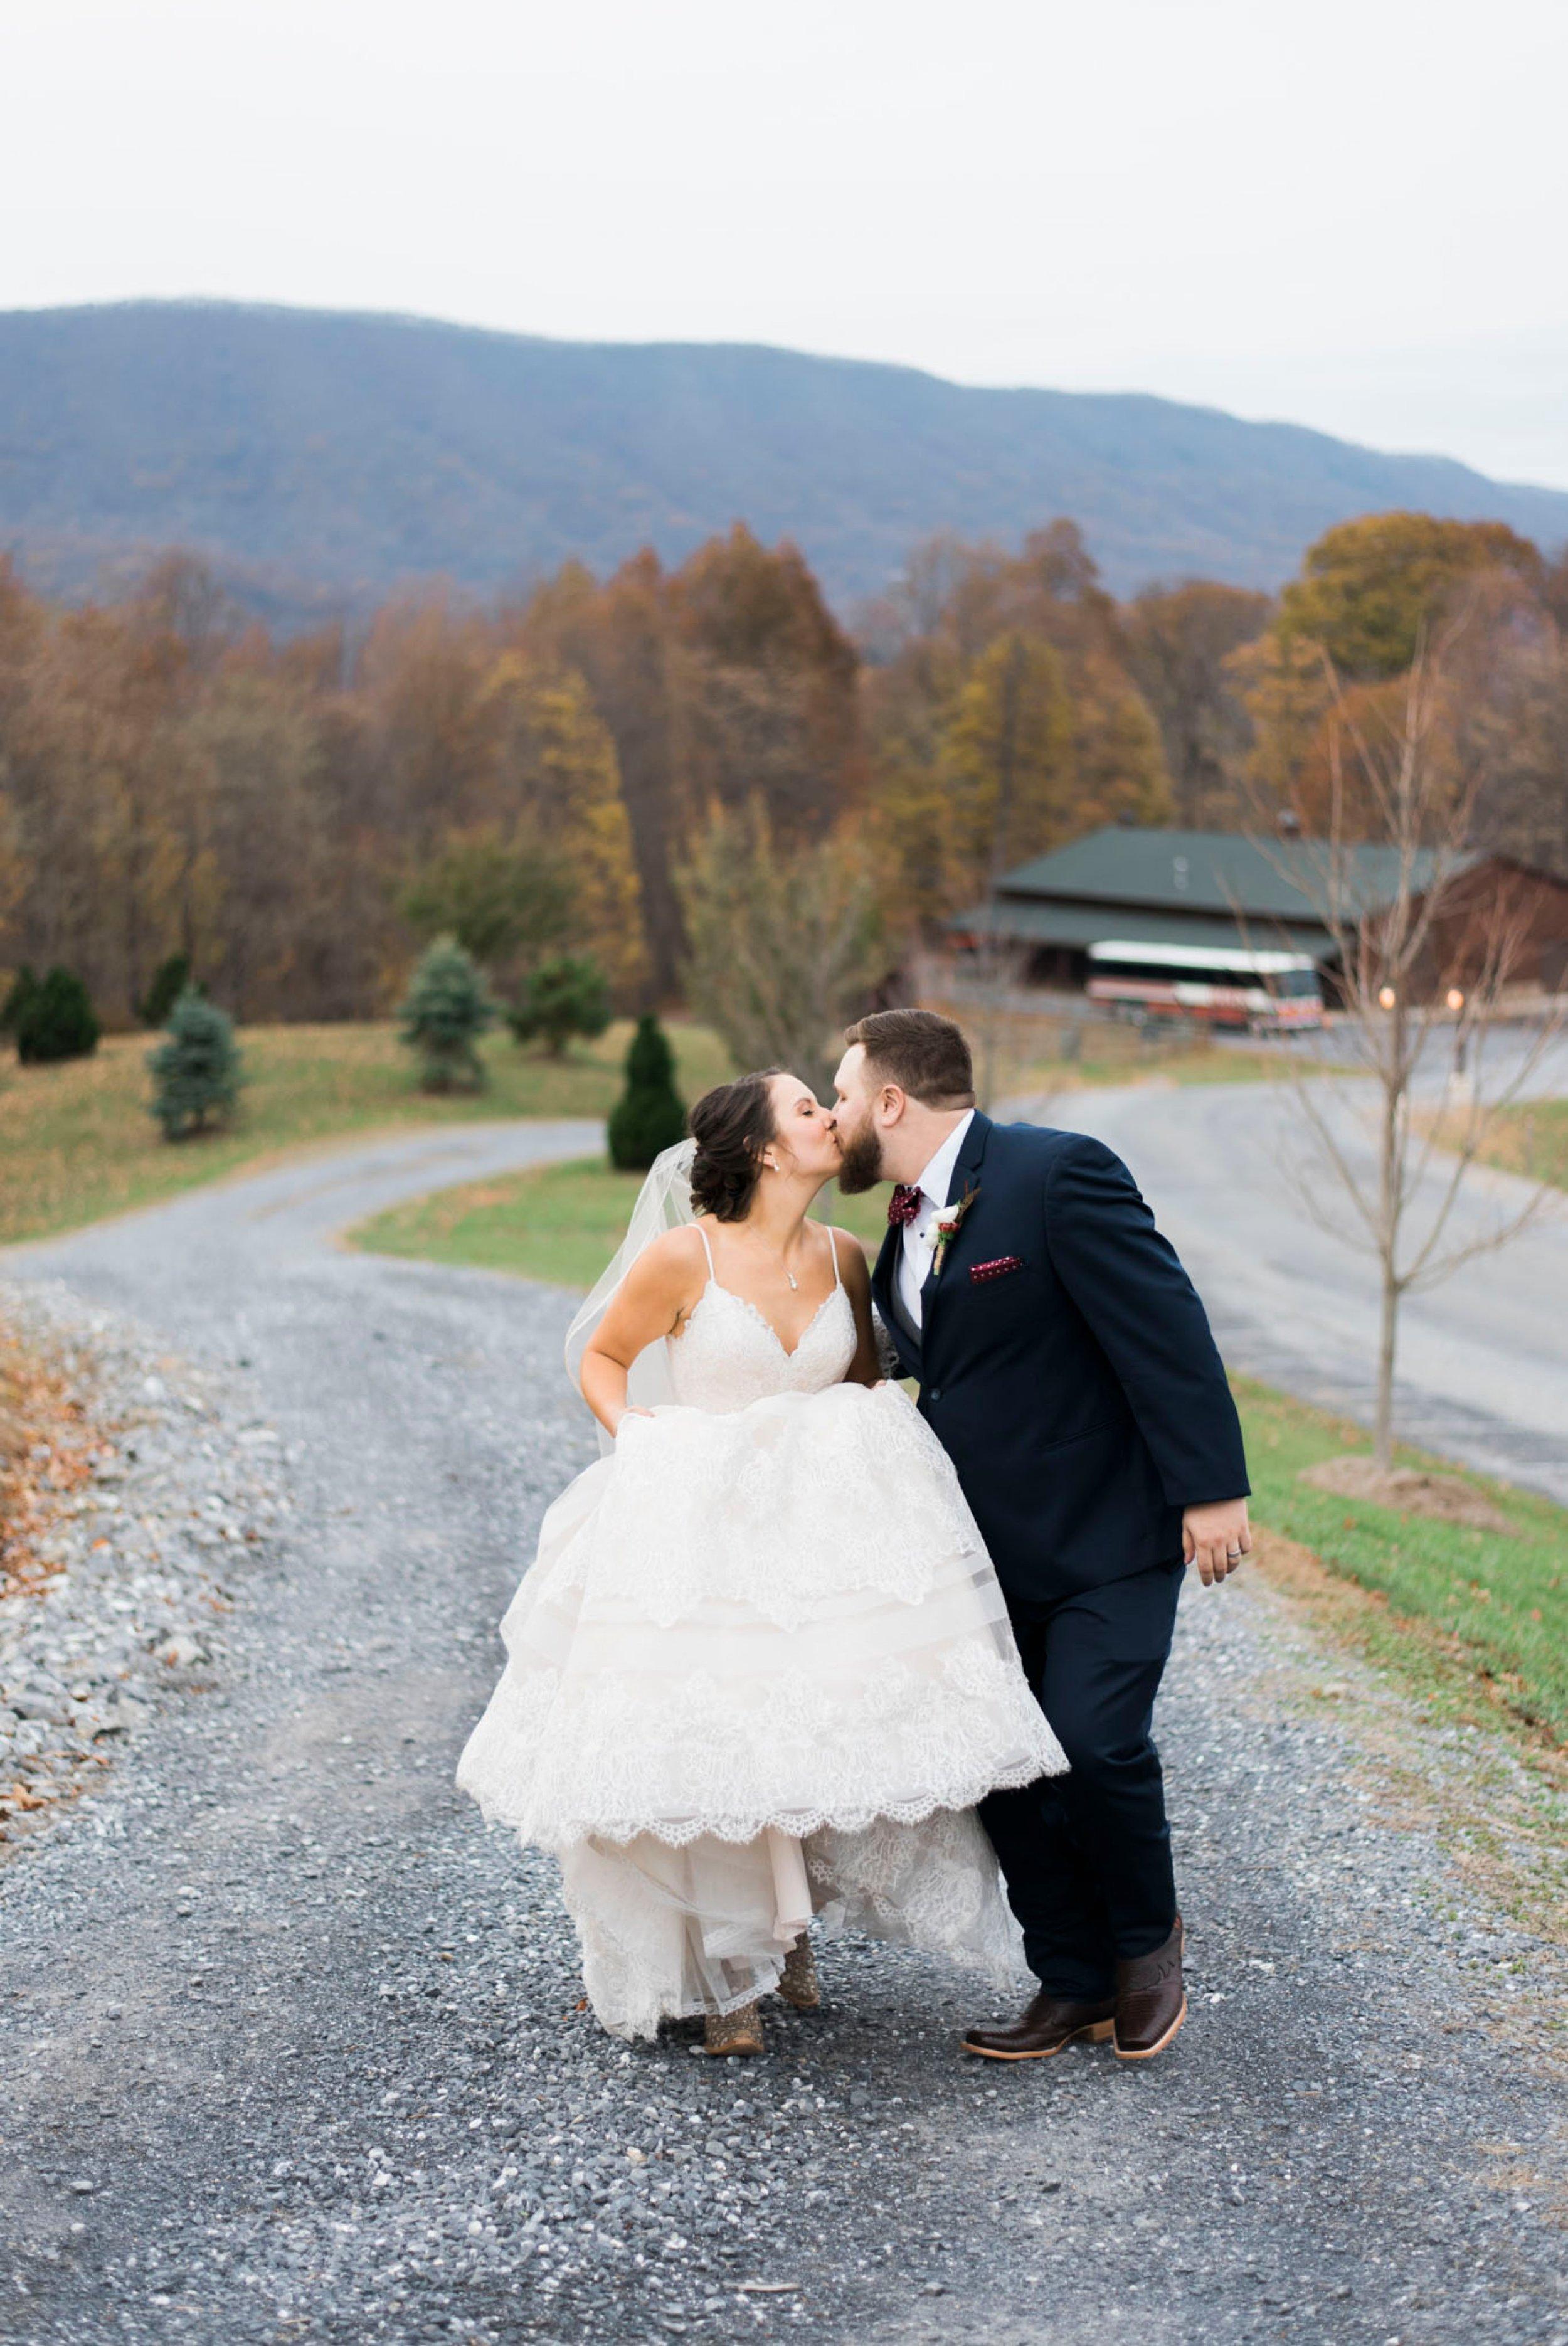 IrvineEstate_LexingtonVA_Wedding_FallWedding_VirginiaWeddingPhotographer 90.jpg